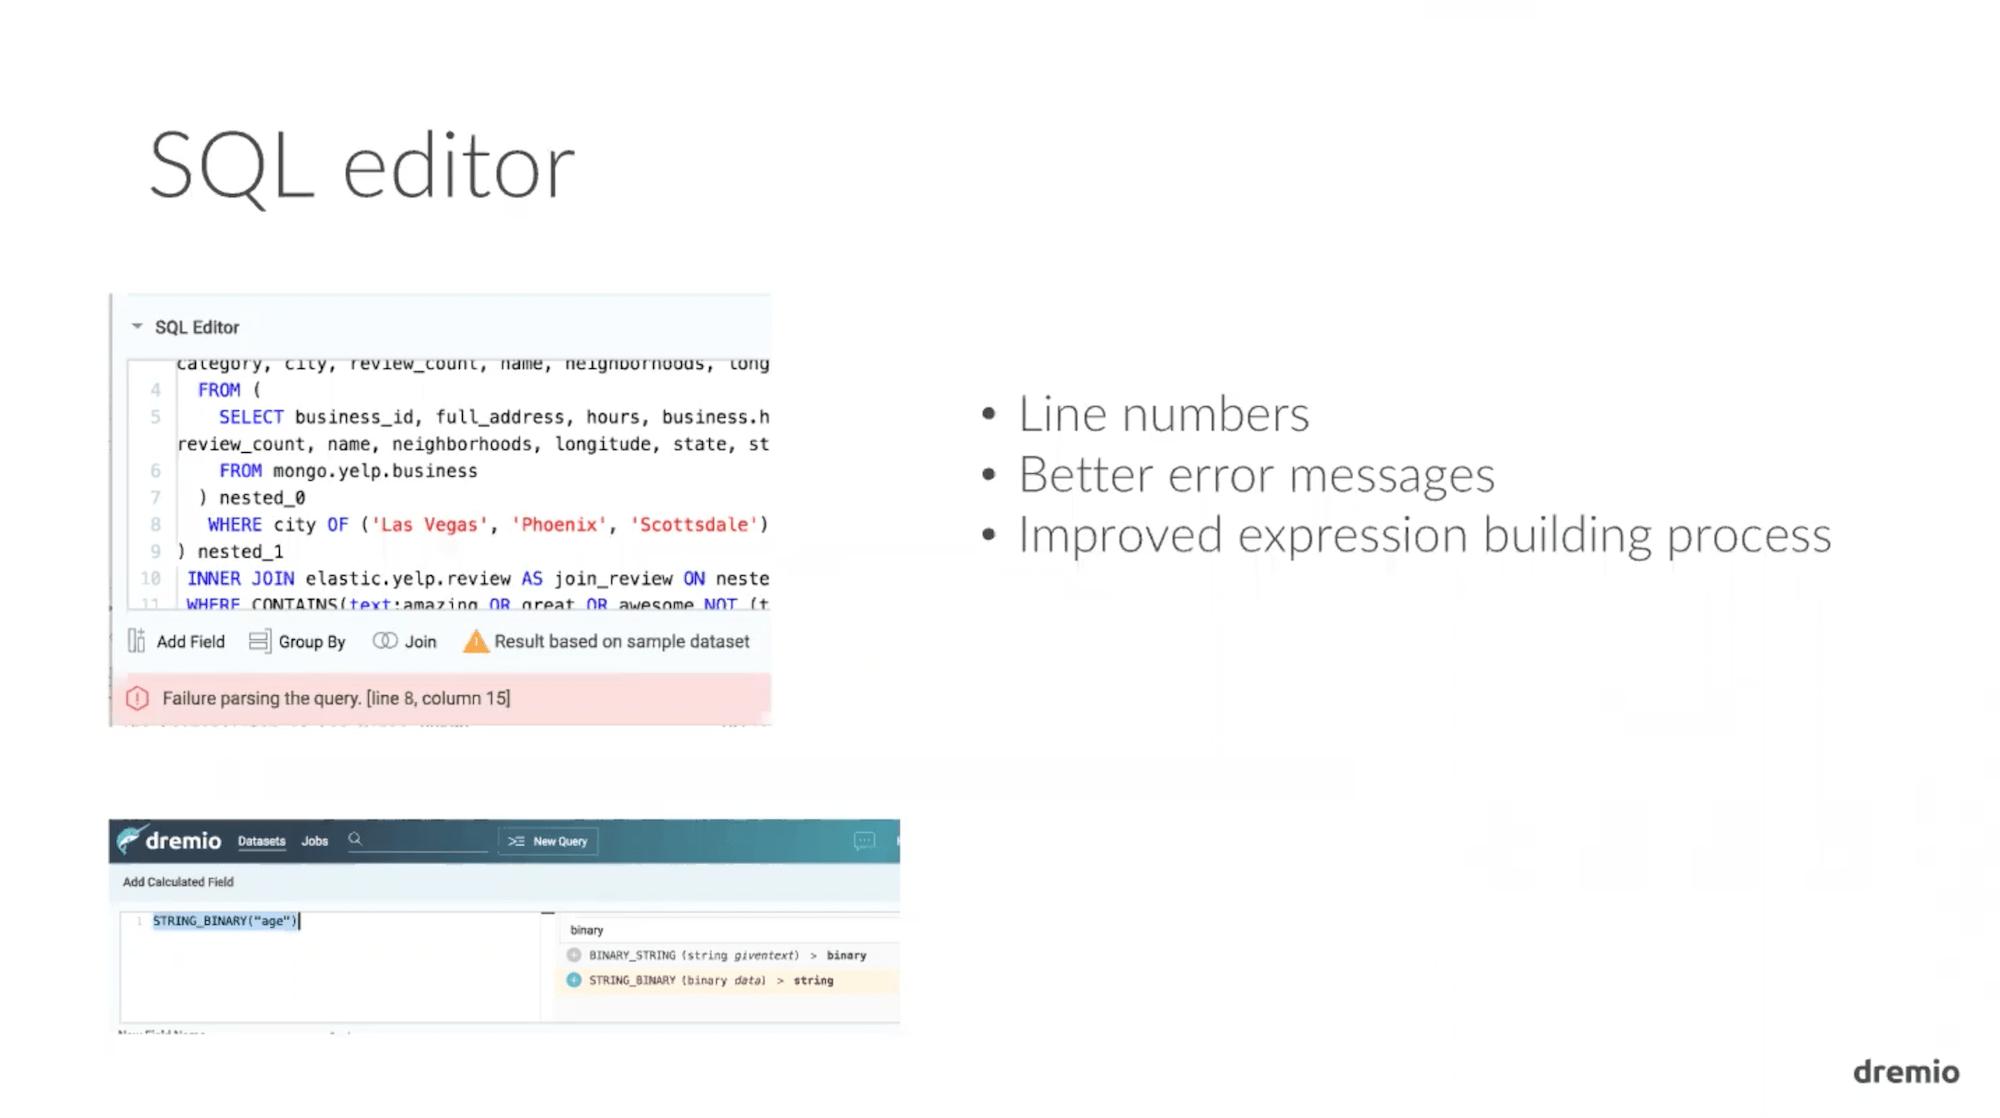 Dremio 1.3 SQL Editor